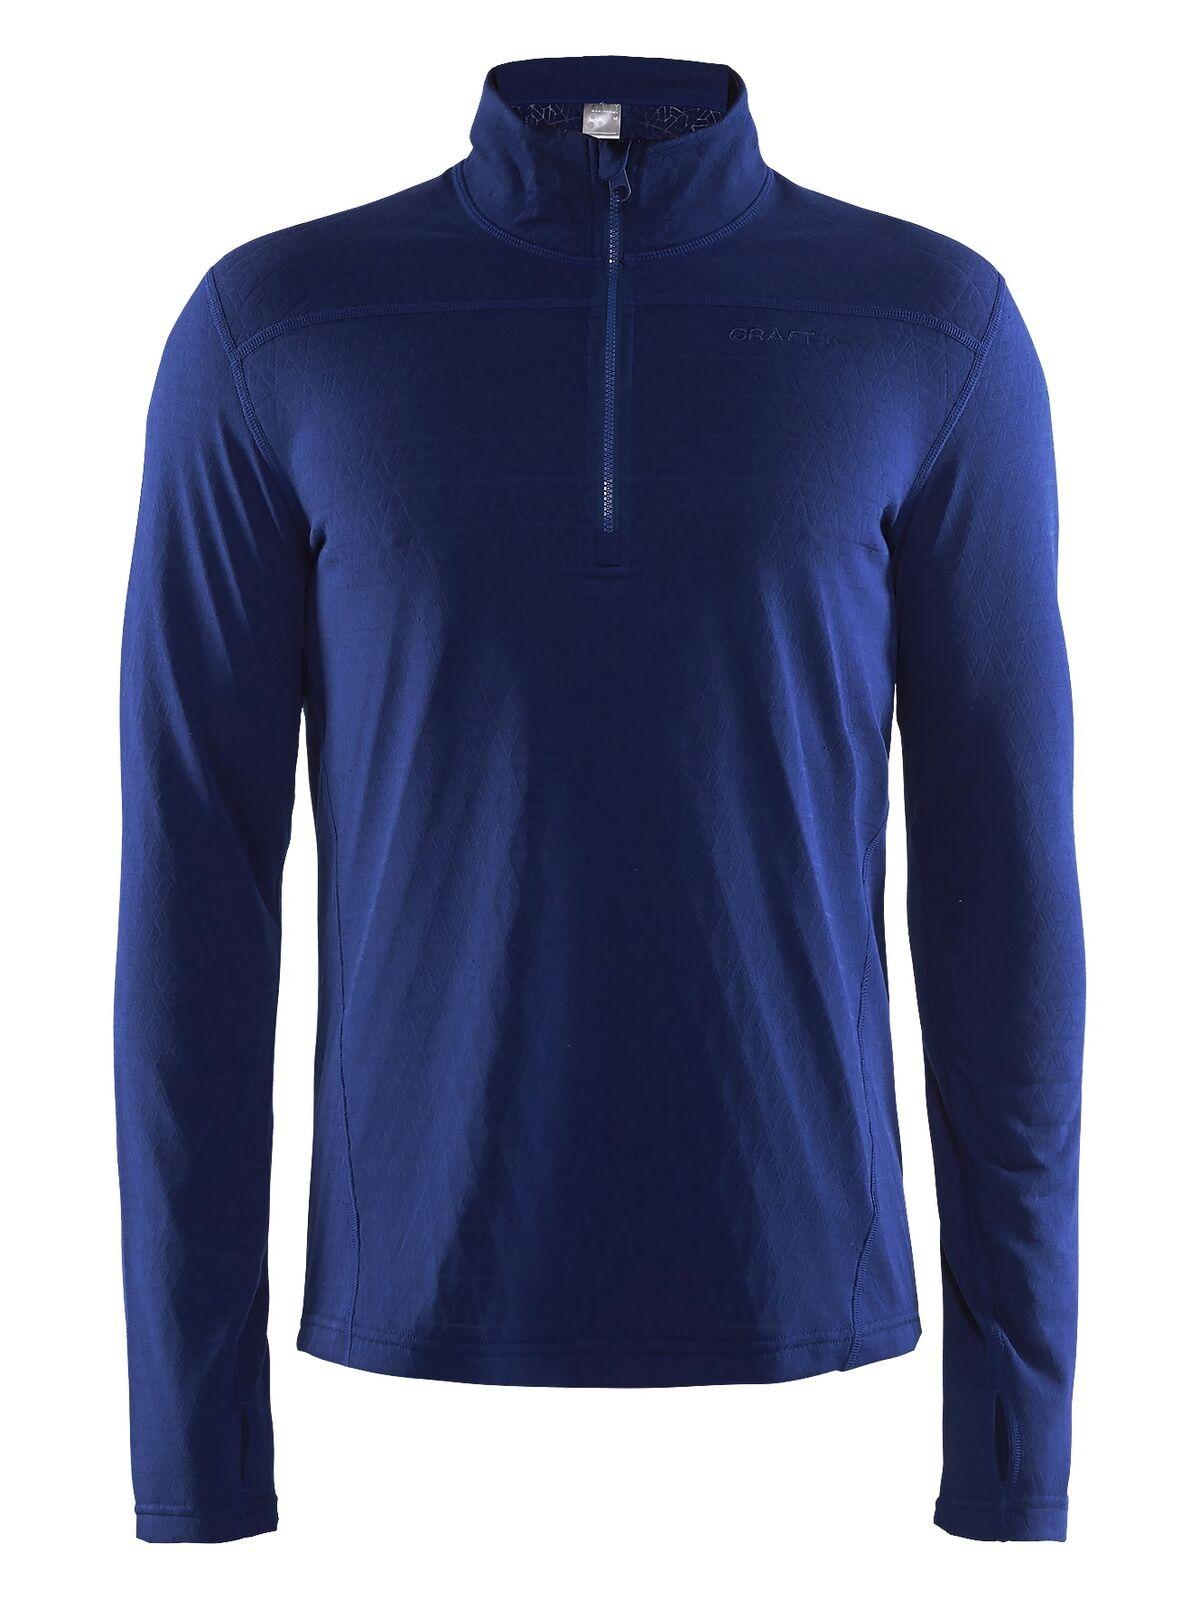 Craft PIN HALFZIP M M M Herren Pullover Sweatshirt Longsleeve Sportpullover b47376